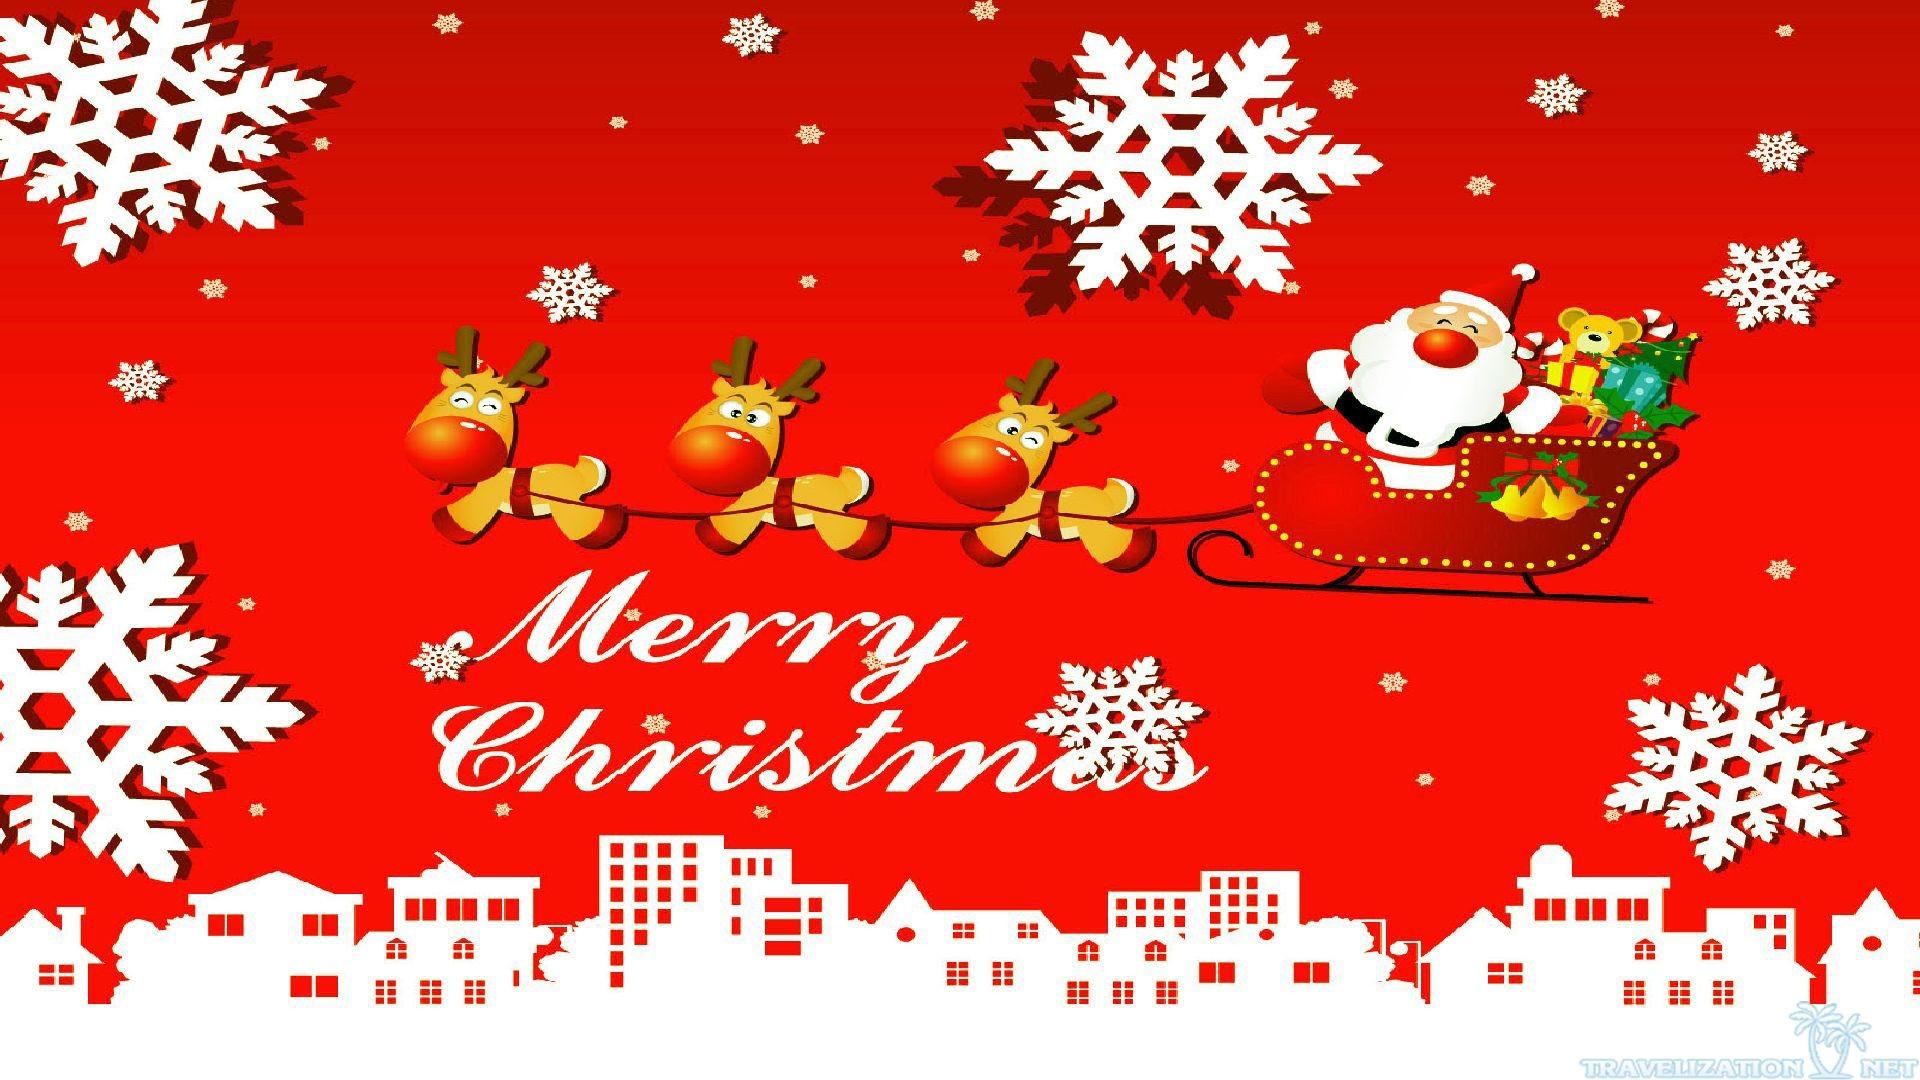 cute merry christmas wallpaper 26007poster.jpg